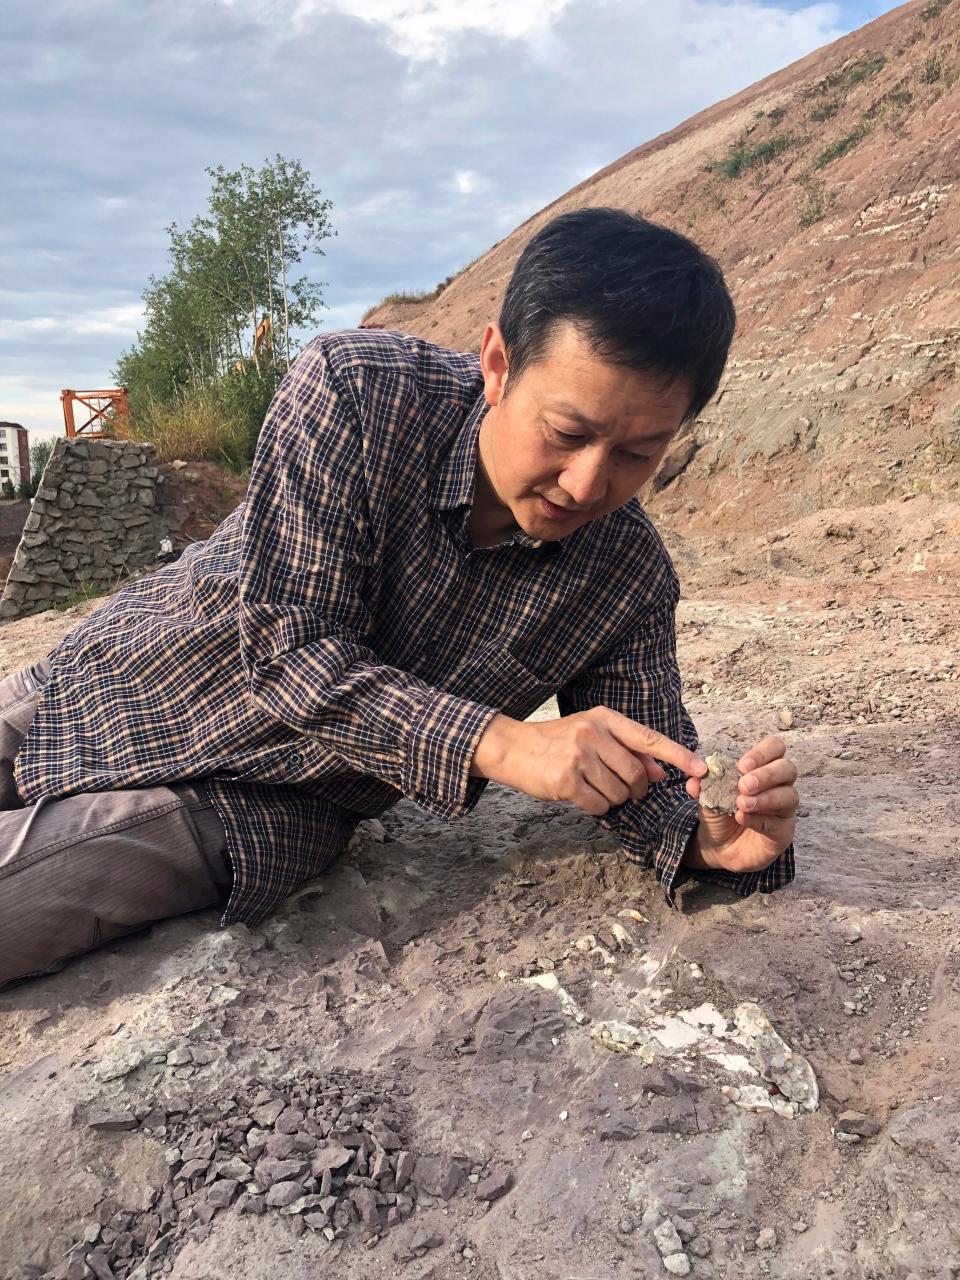 Paleontologist dating